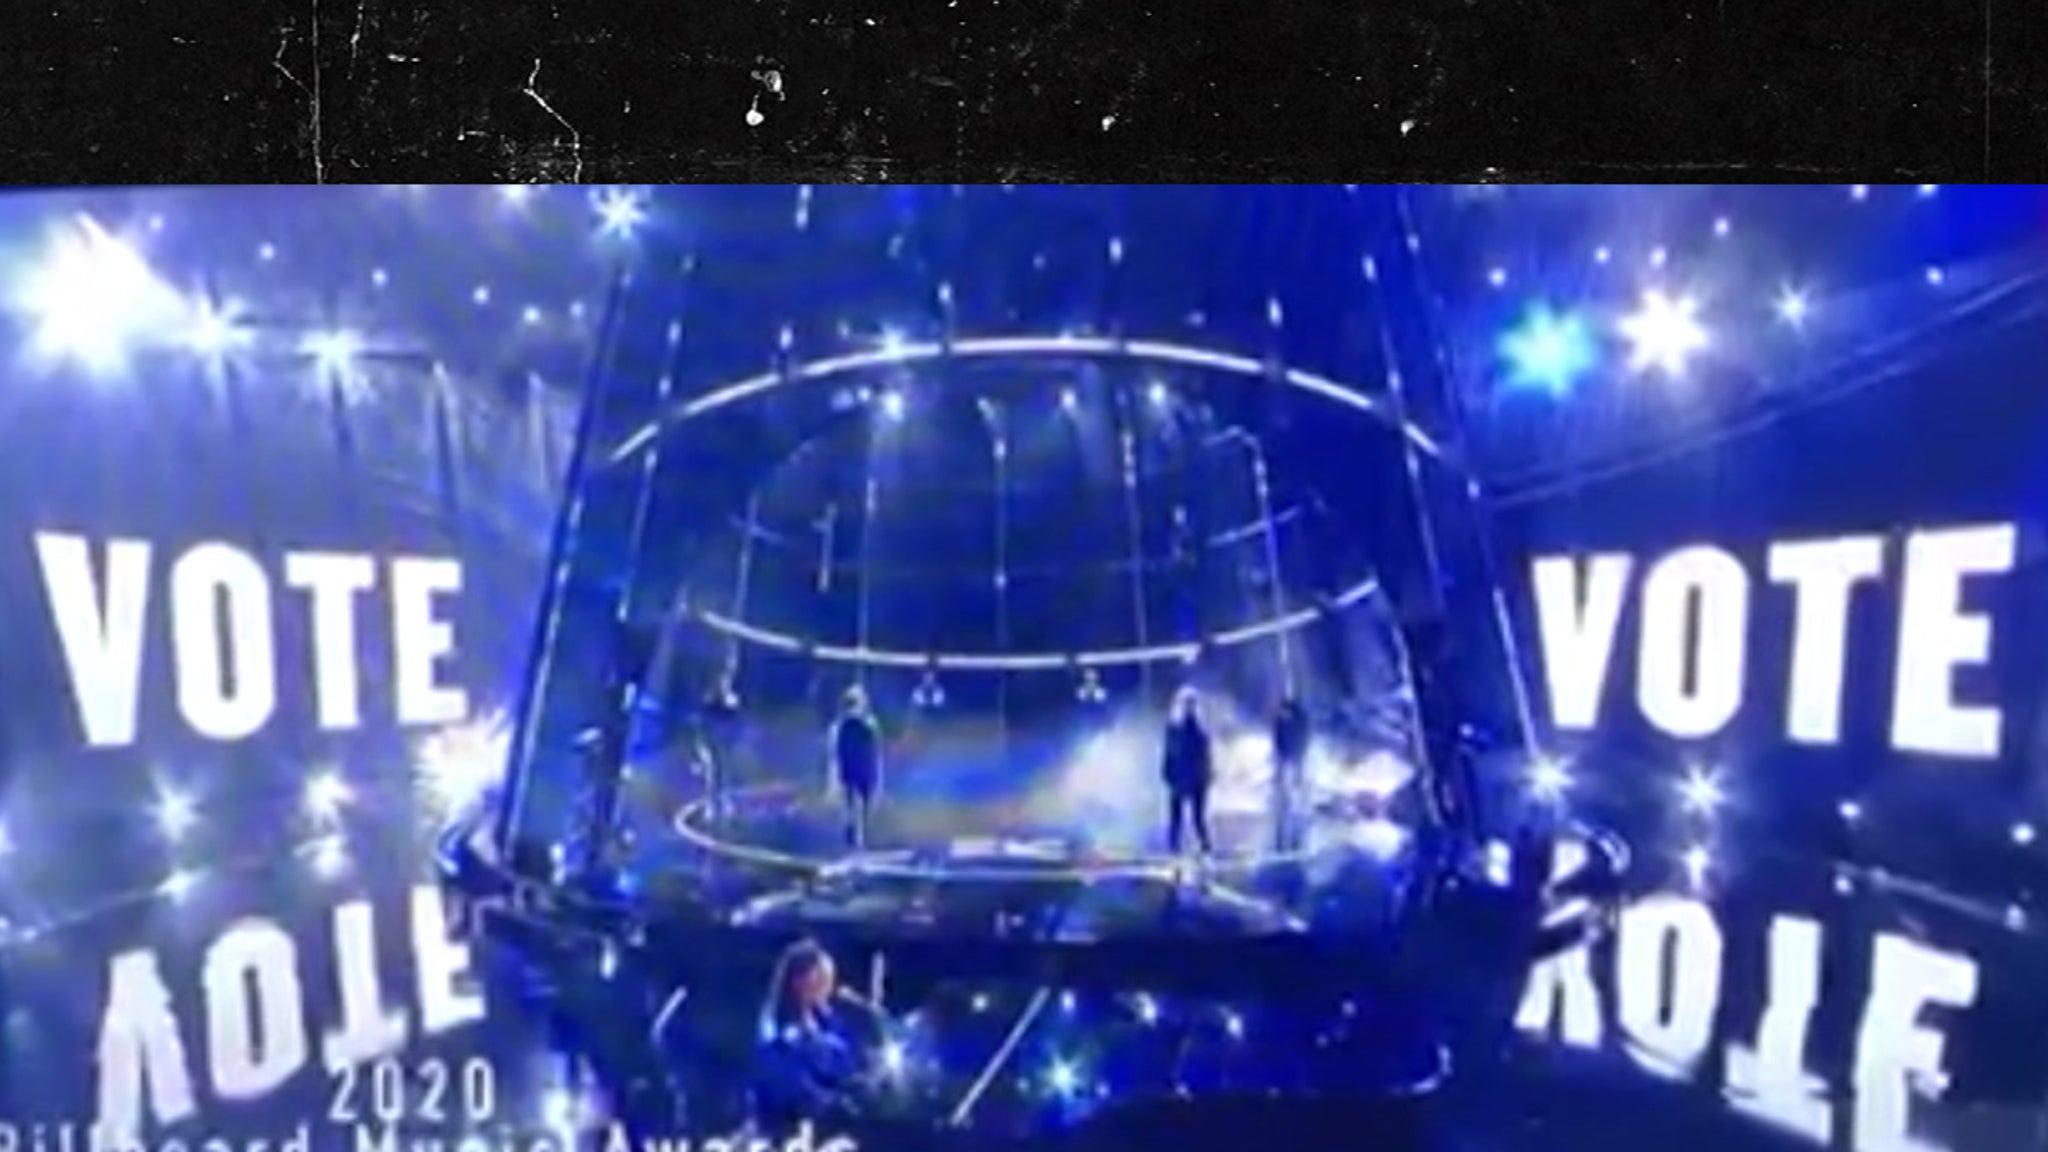 Demi Lovato's 'Vote' Message Muzzled By NBC During Billboard Awards